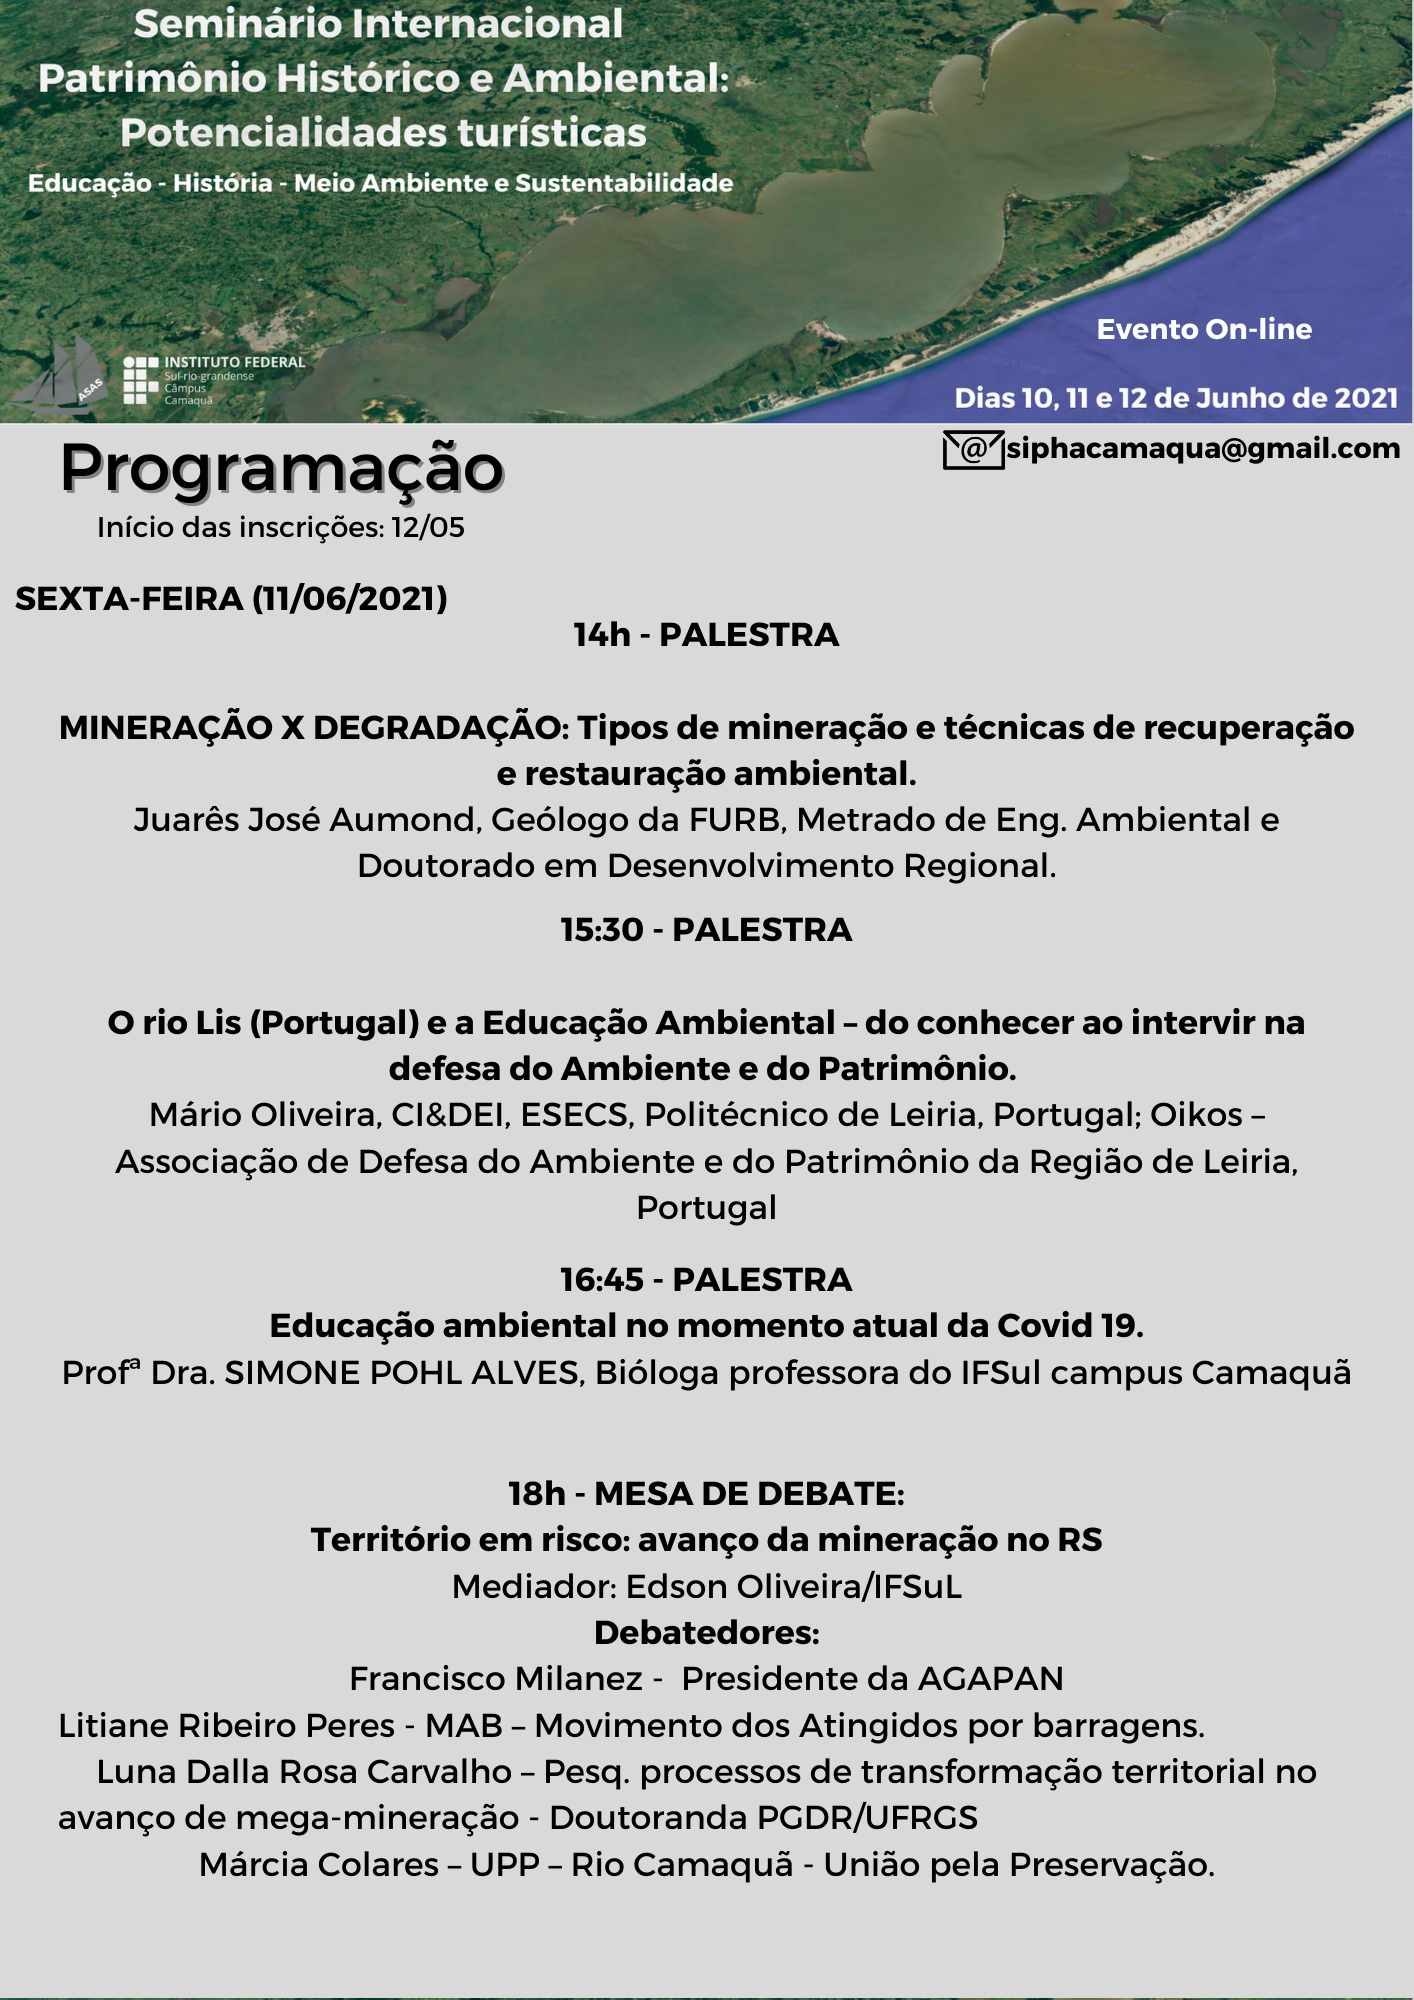 Dvulgação: scctv.net.br, #scc tv. #webtv,